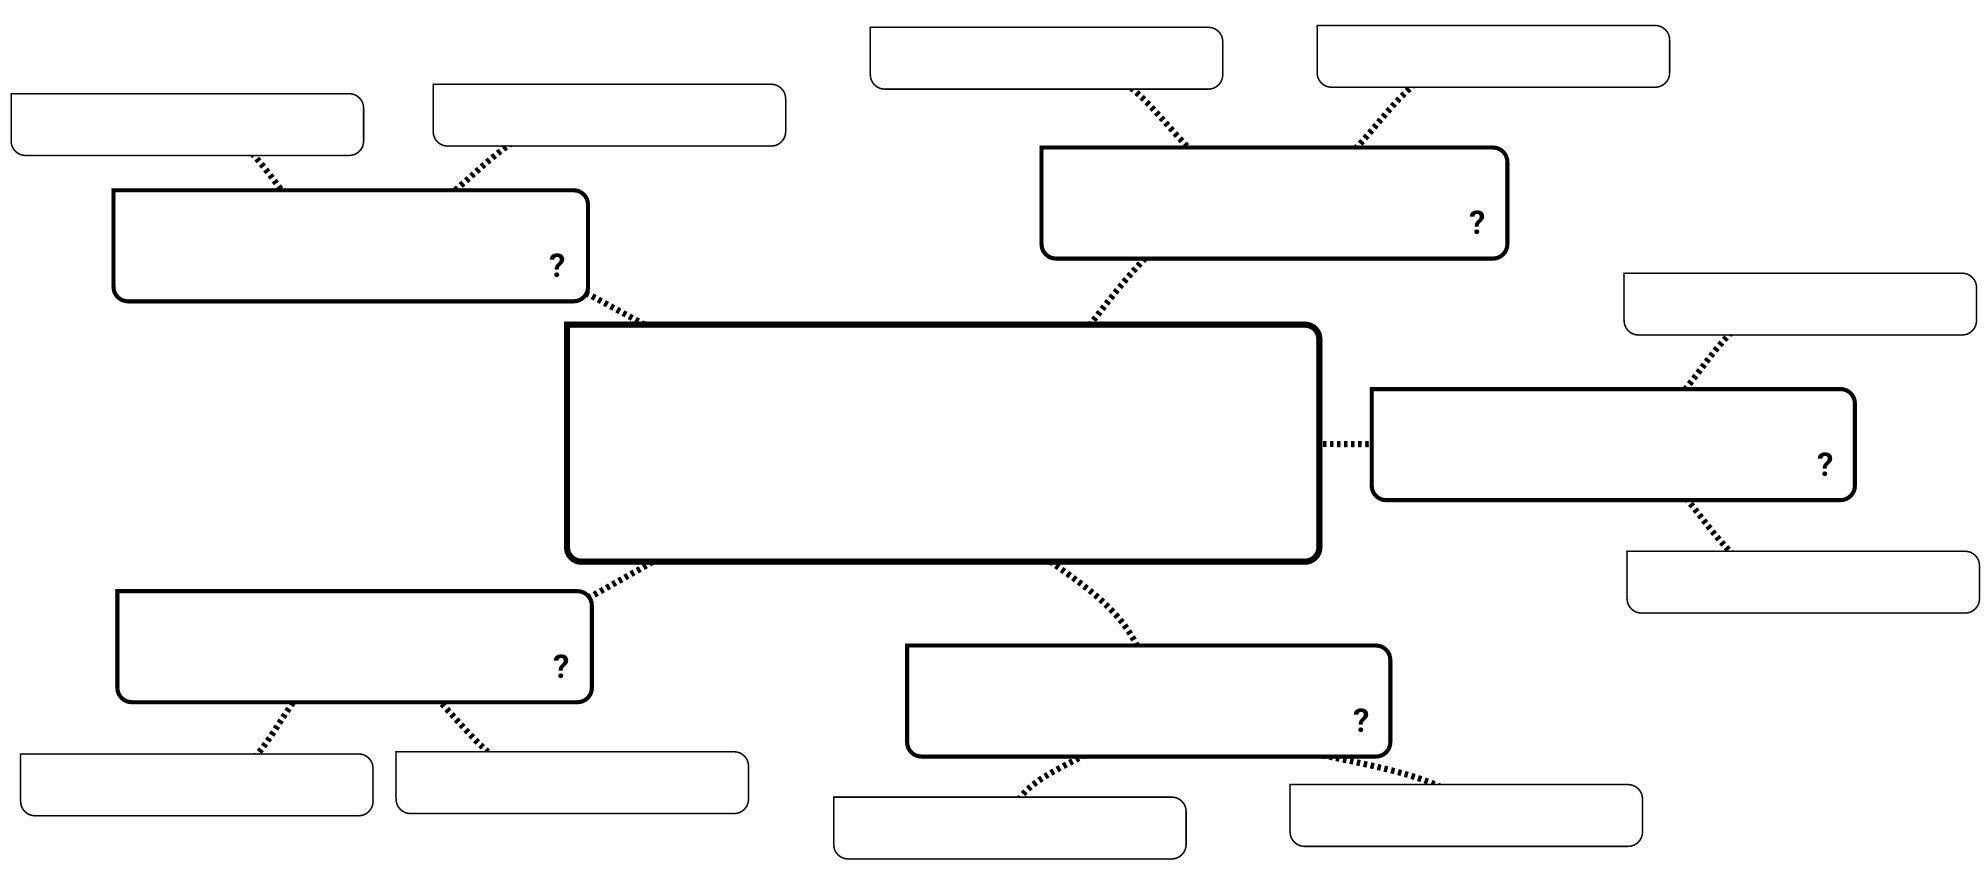 (Ideennetz/Mind-Map/Cluster)